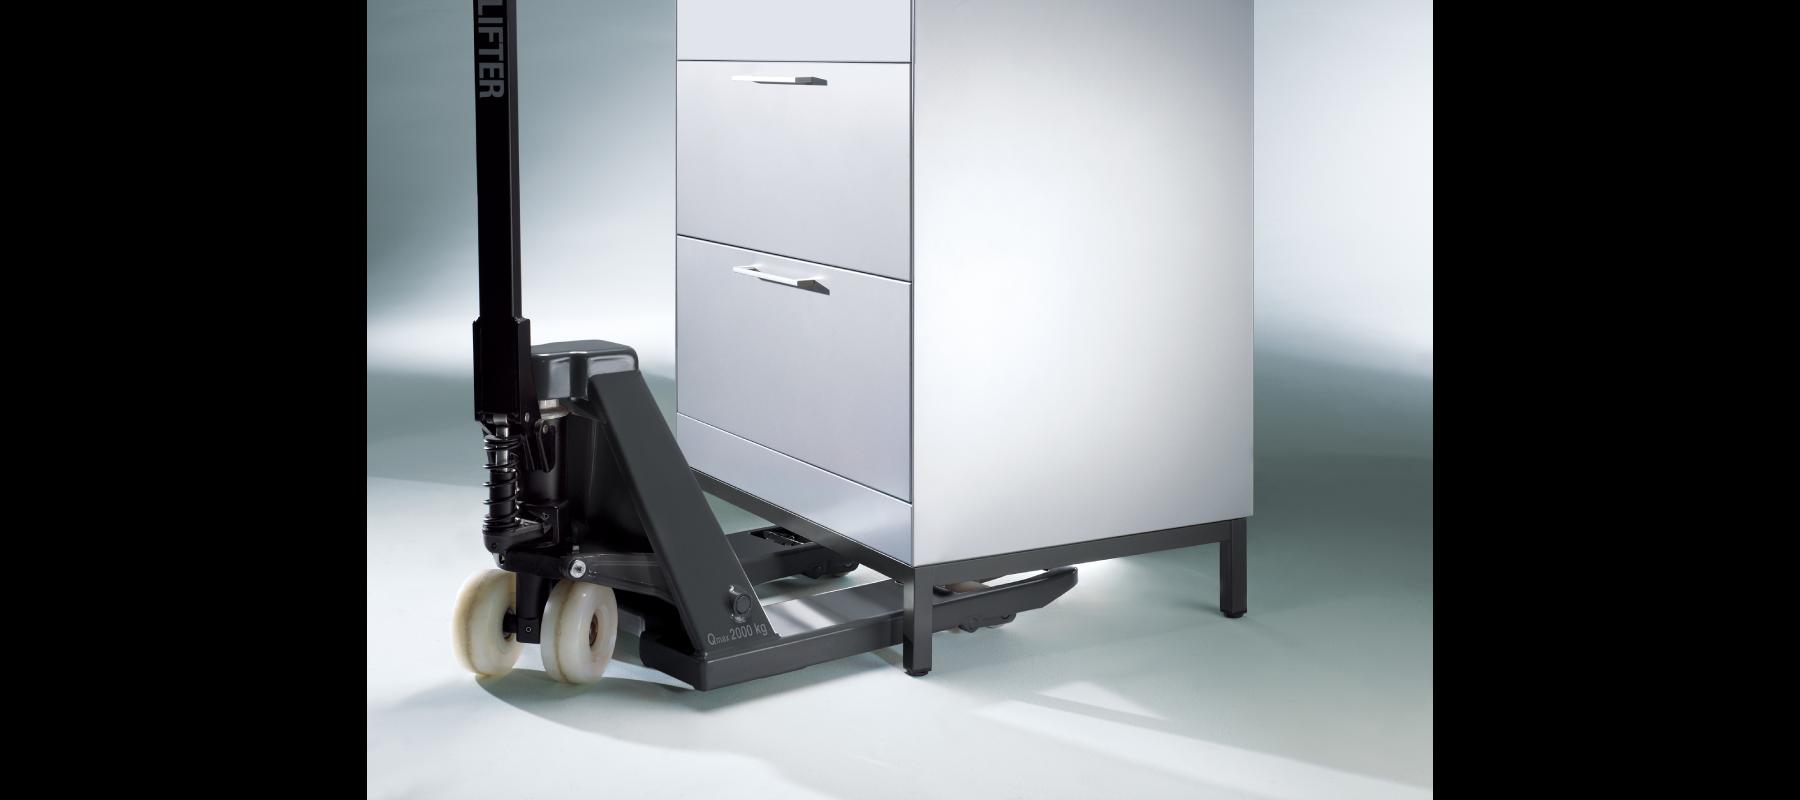 metalowe meble biurowe szafy szufladowe cp detale - 07